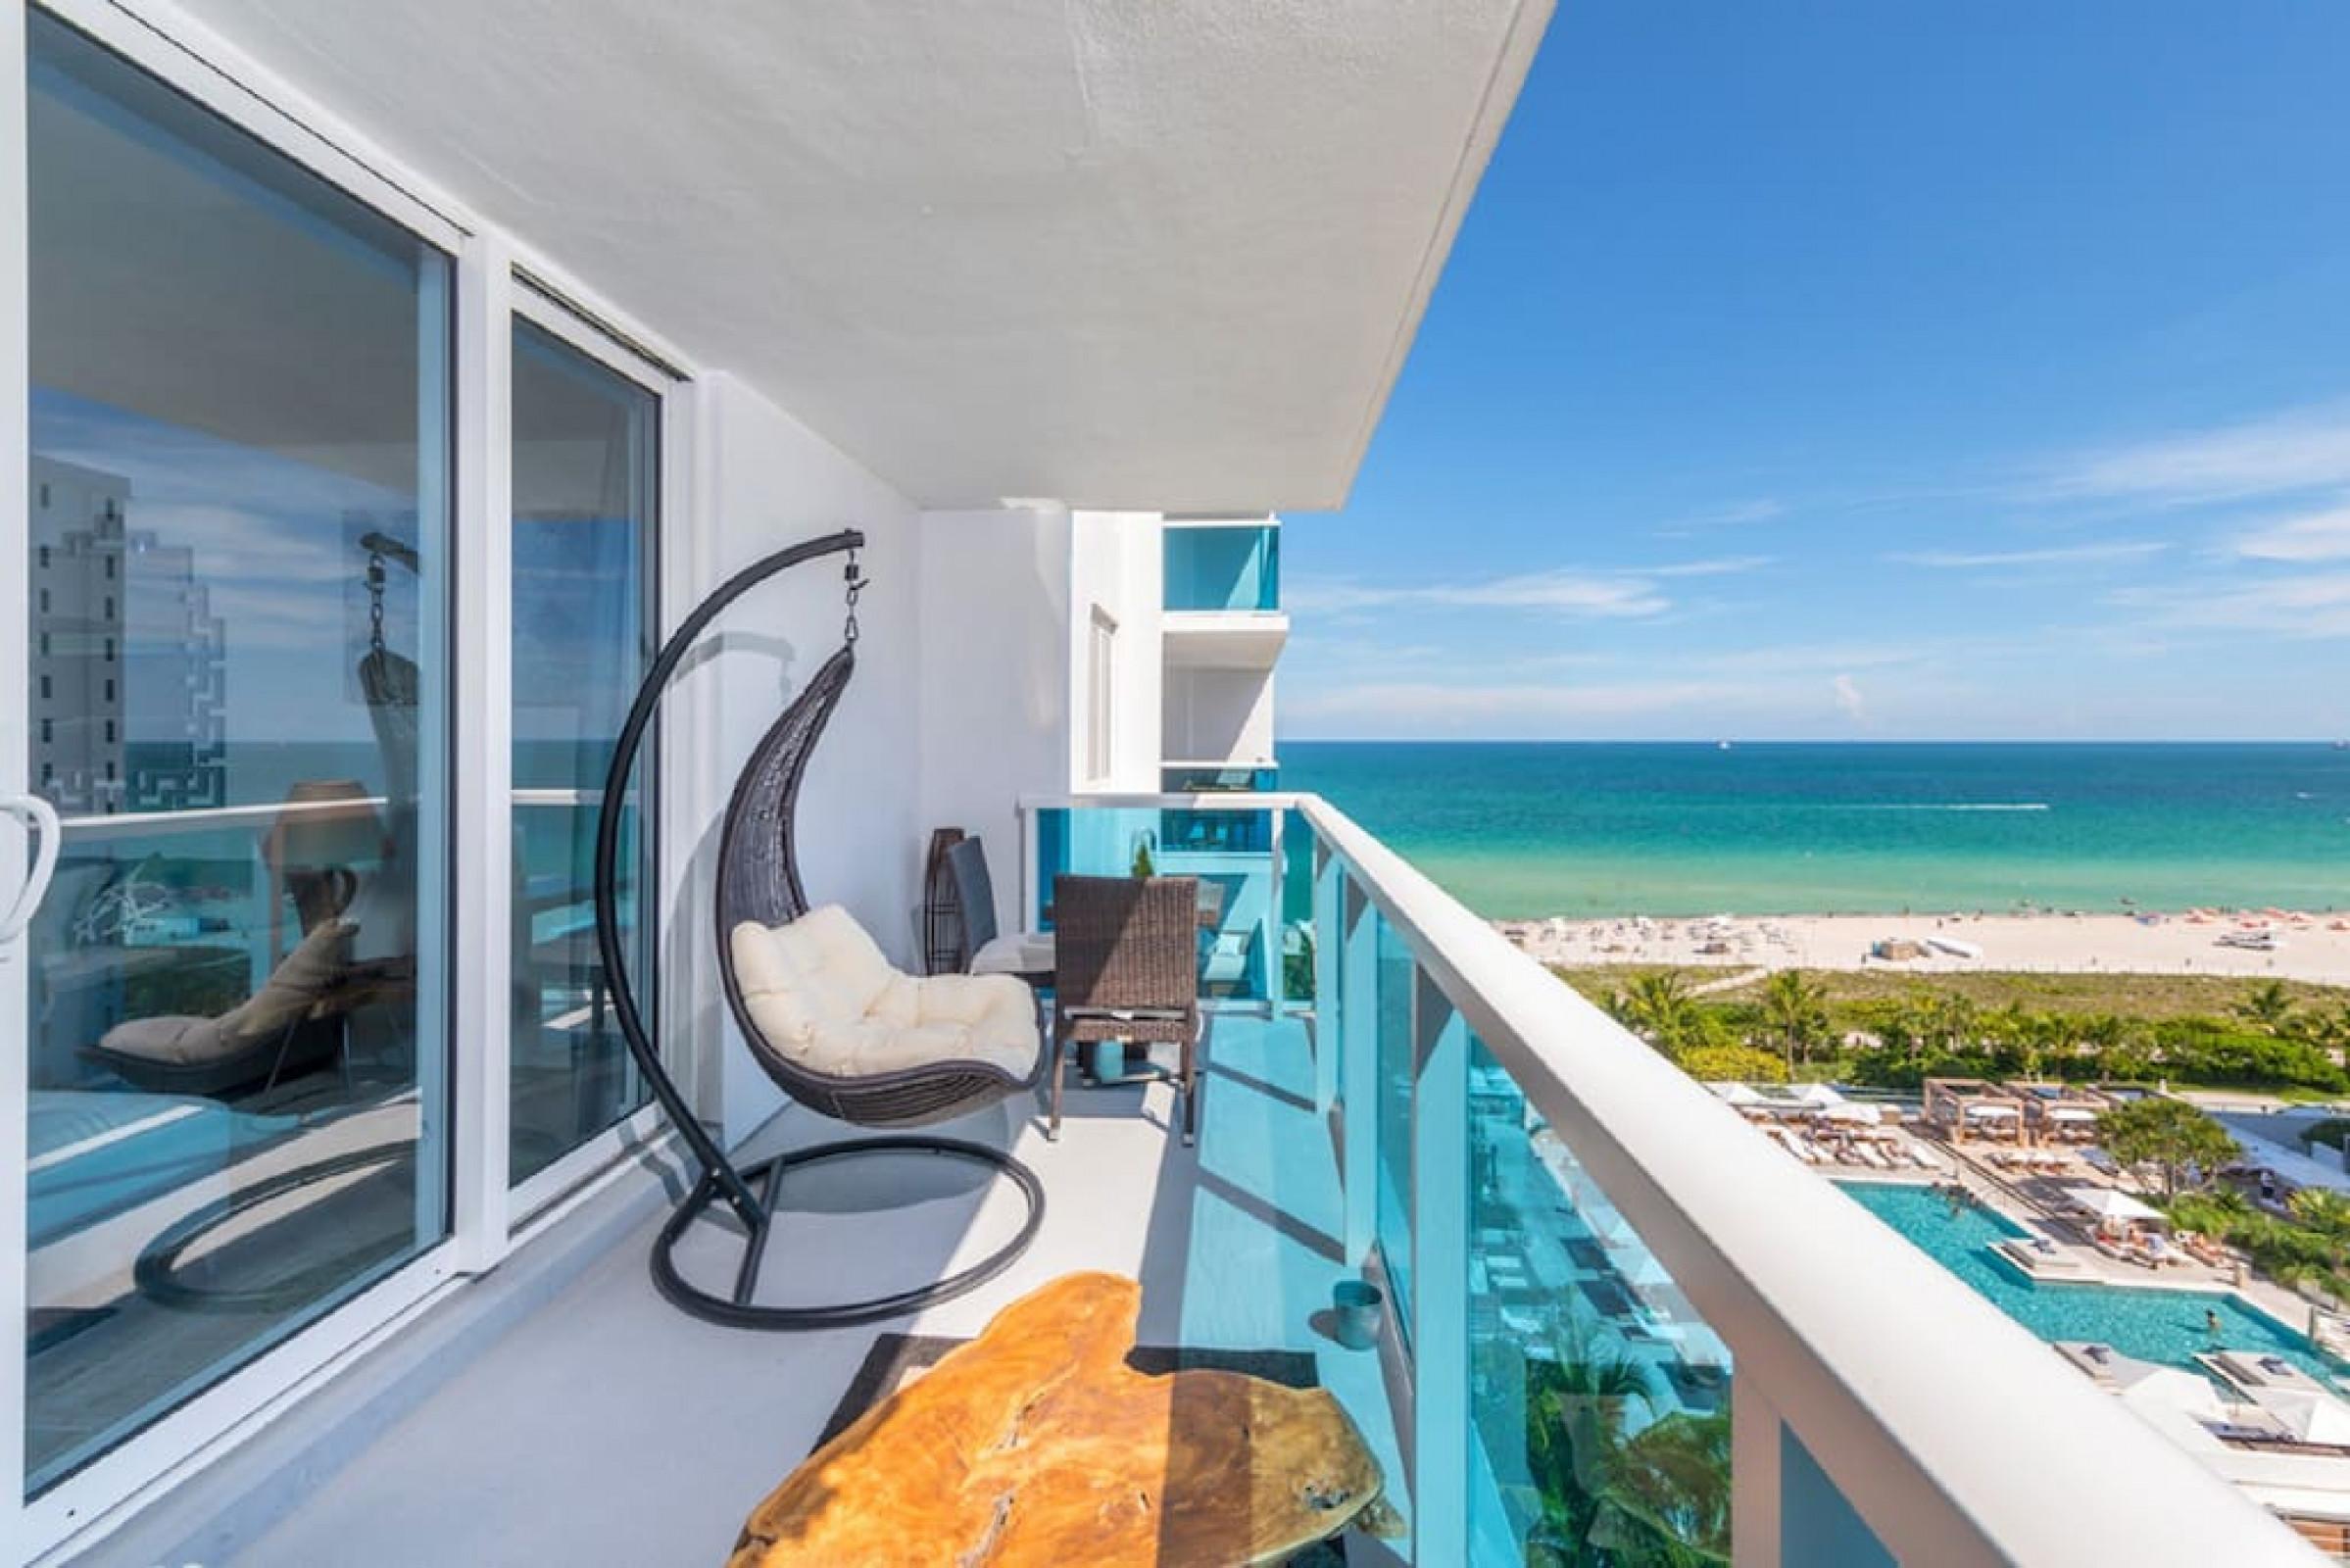 1 Hotel 1108 · Luxury 1 Resort Suite with Ocean/Pool Balcony 5* 2